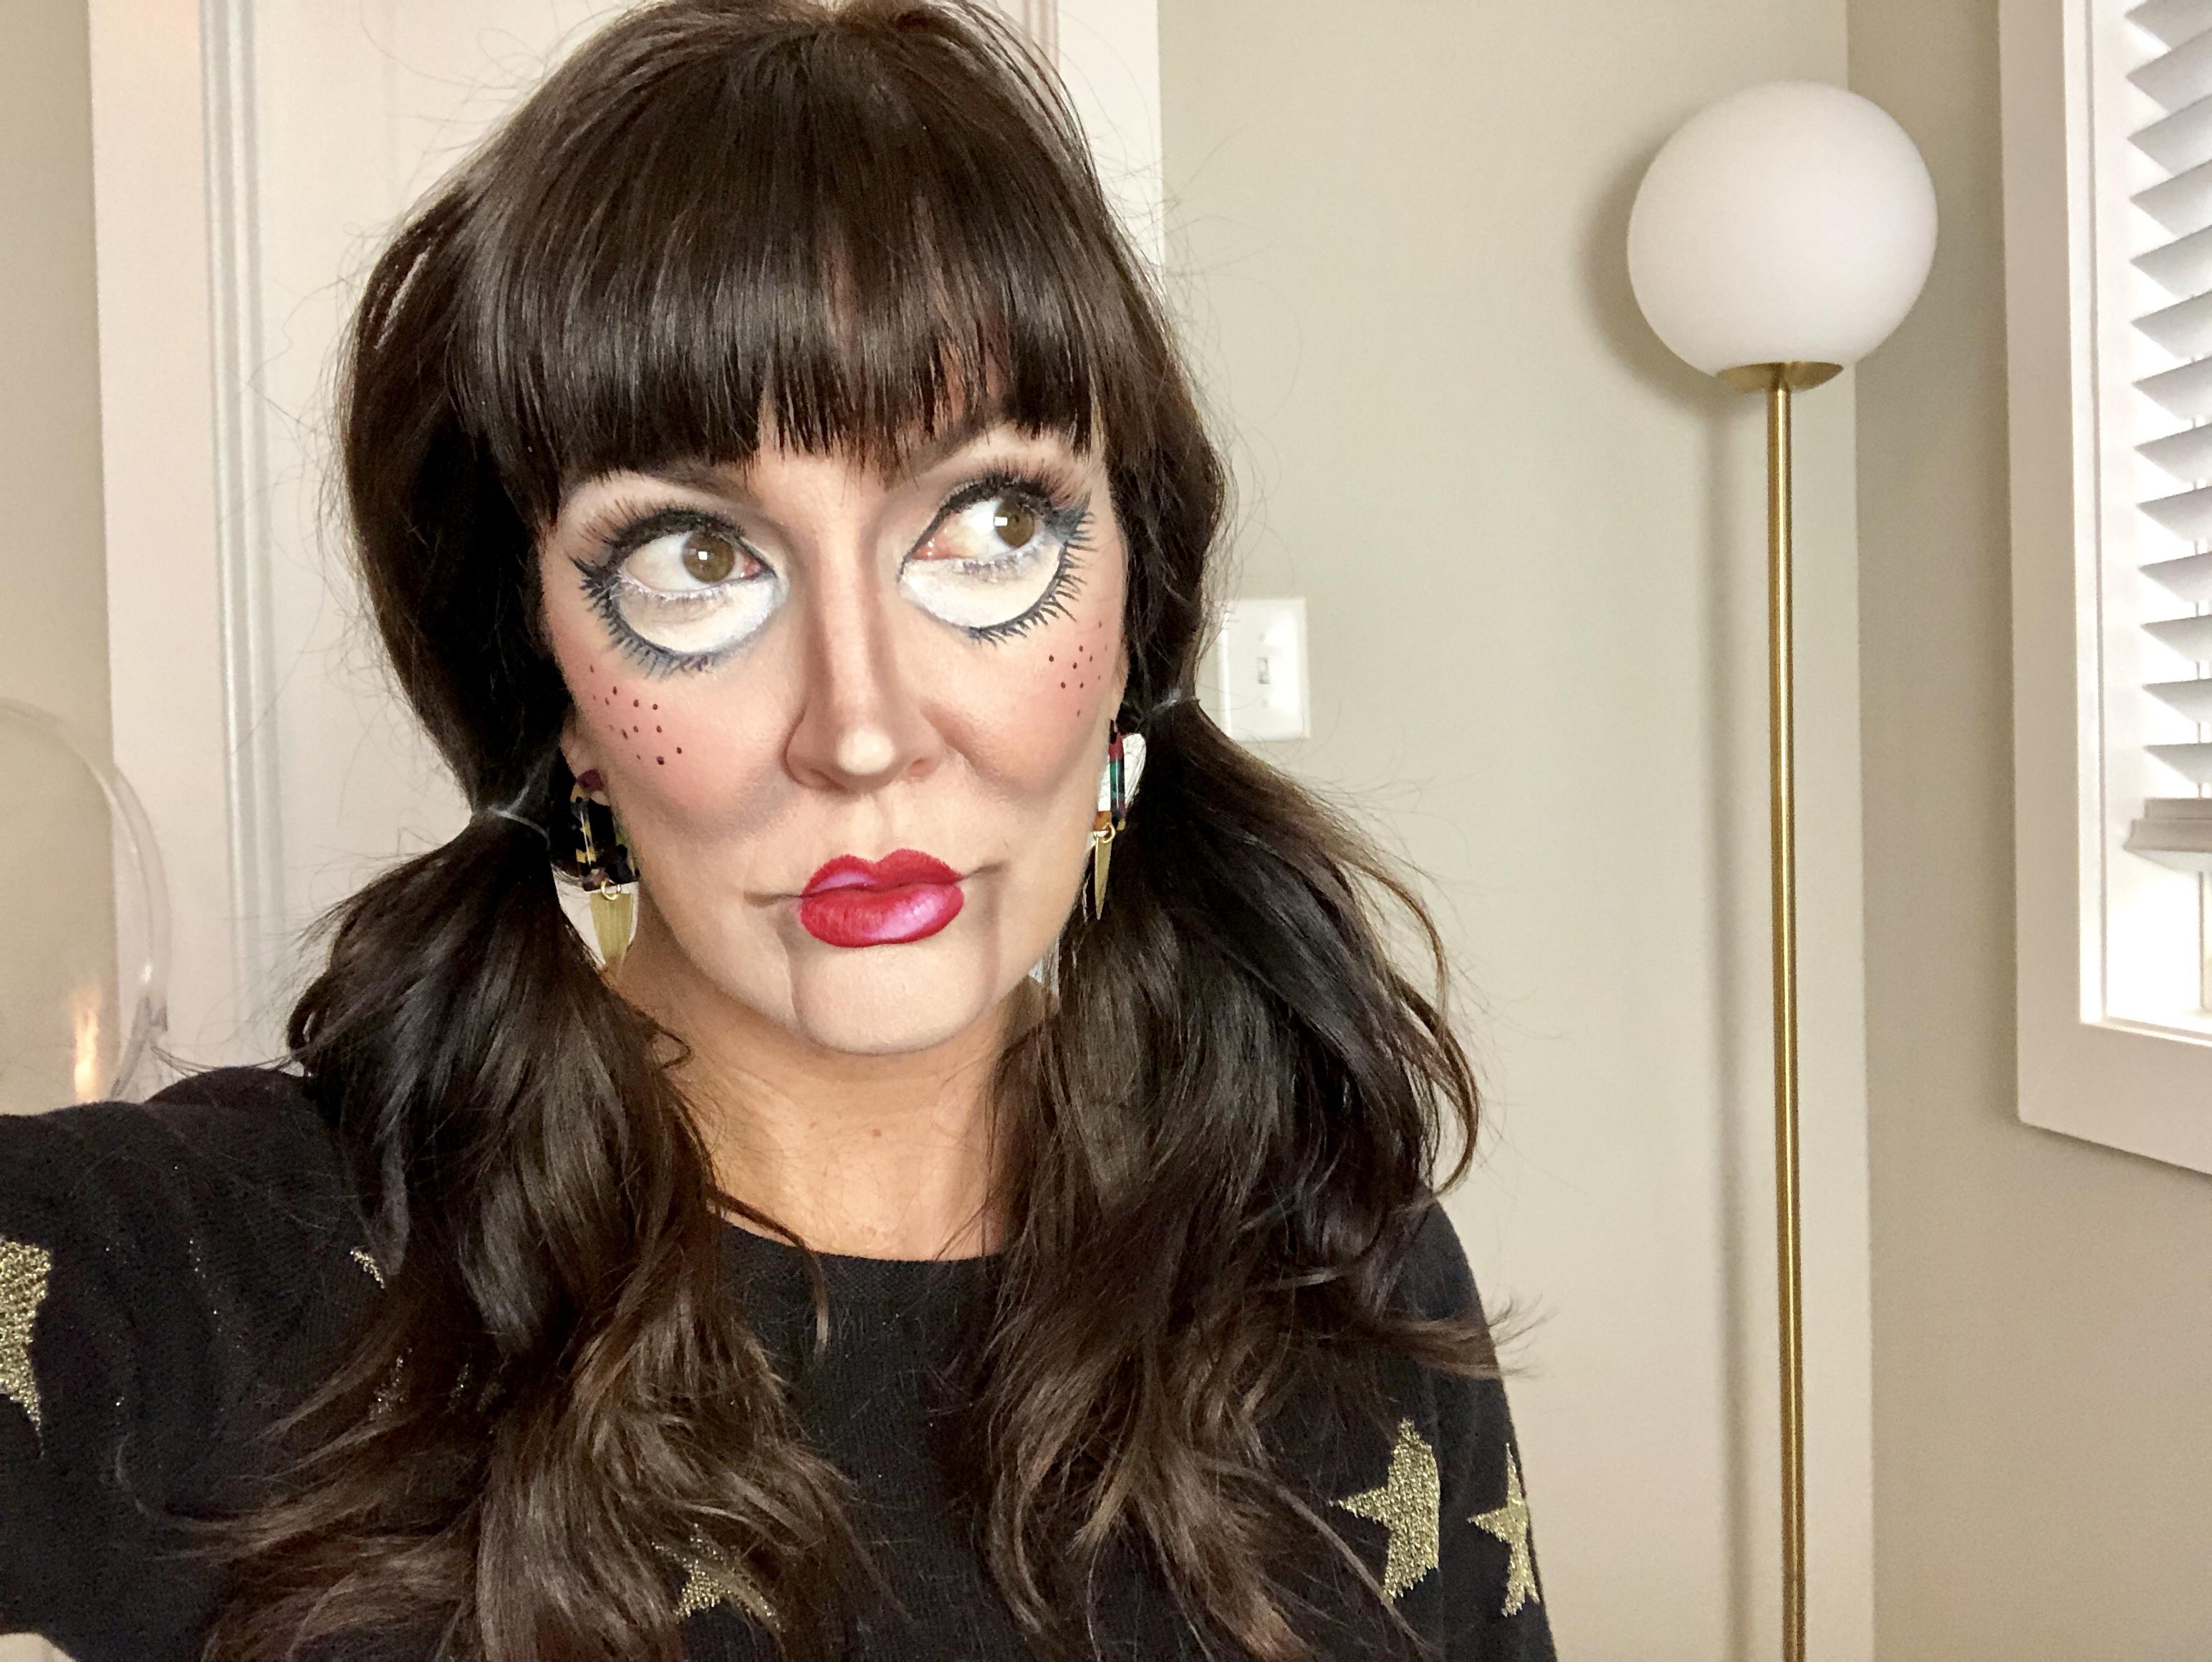 creepy doll makeup for Halloween makeup ideas